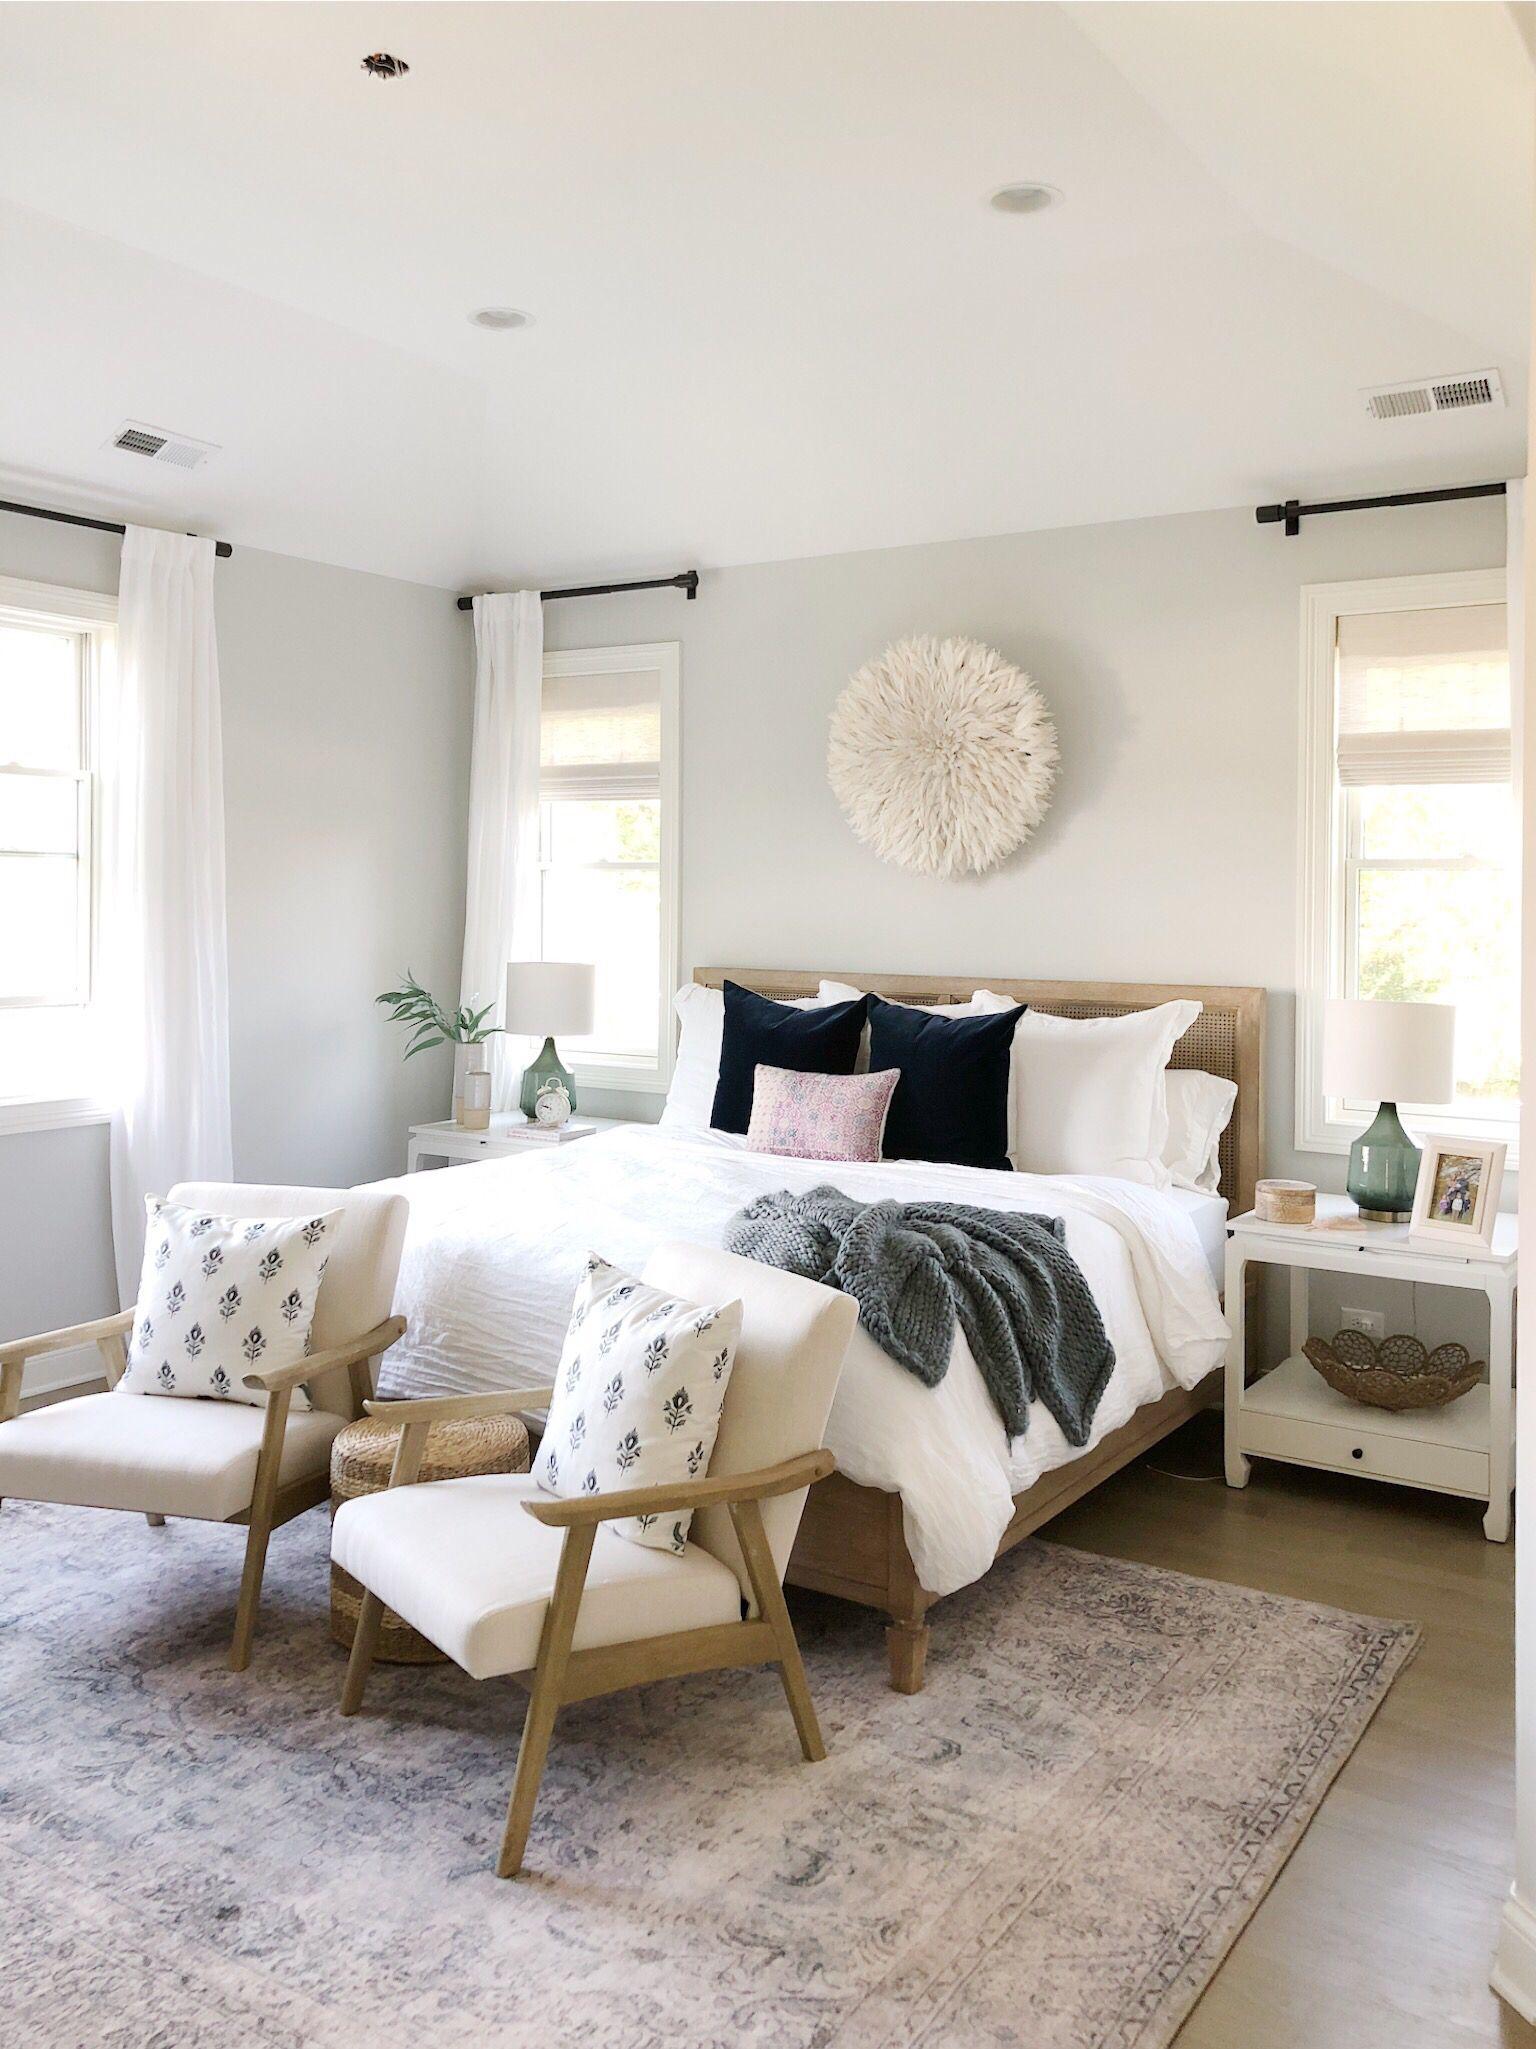 Bedroom with benjamin moore gray owl pottery barn bed vintage